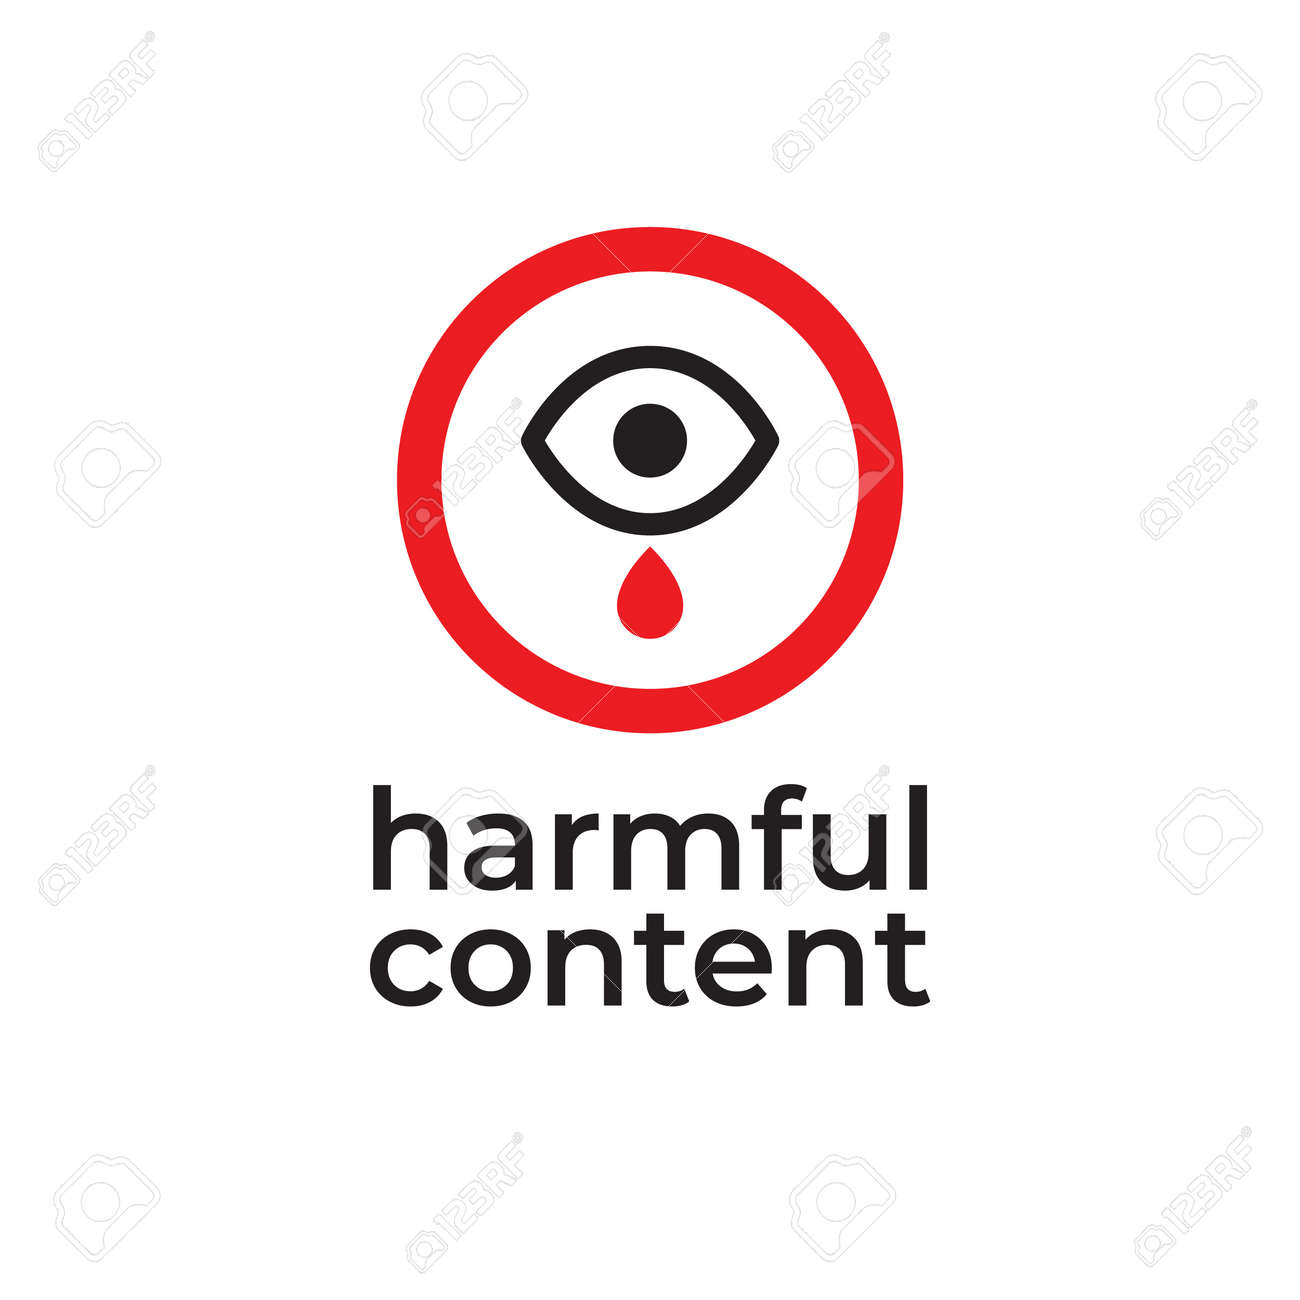 Parental control icon, vector clip art. Harmful content. Warning sign, notice, danger sign. Social problem. - 163226509